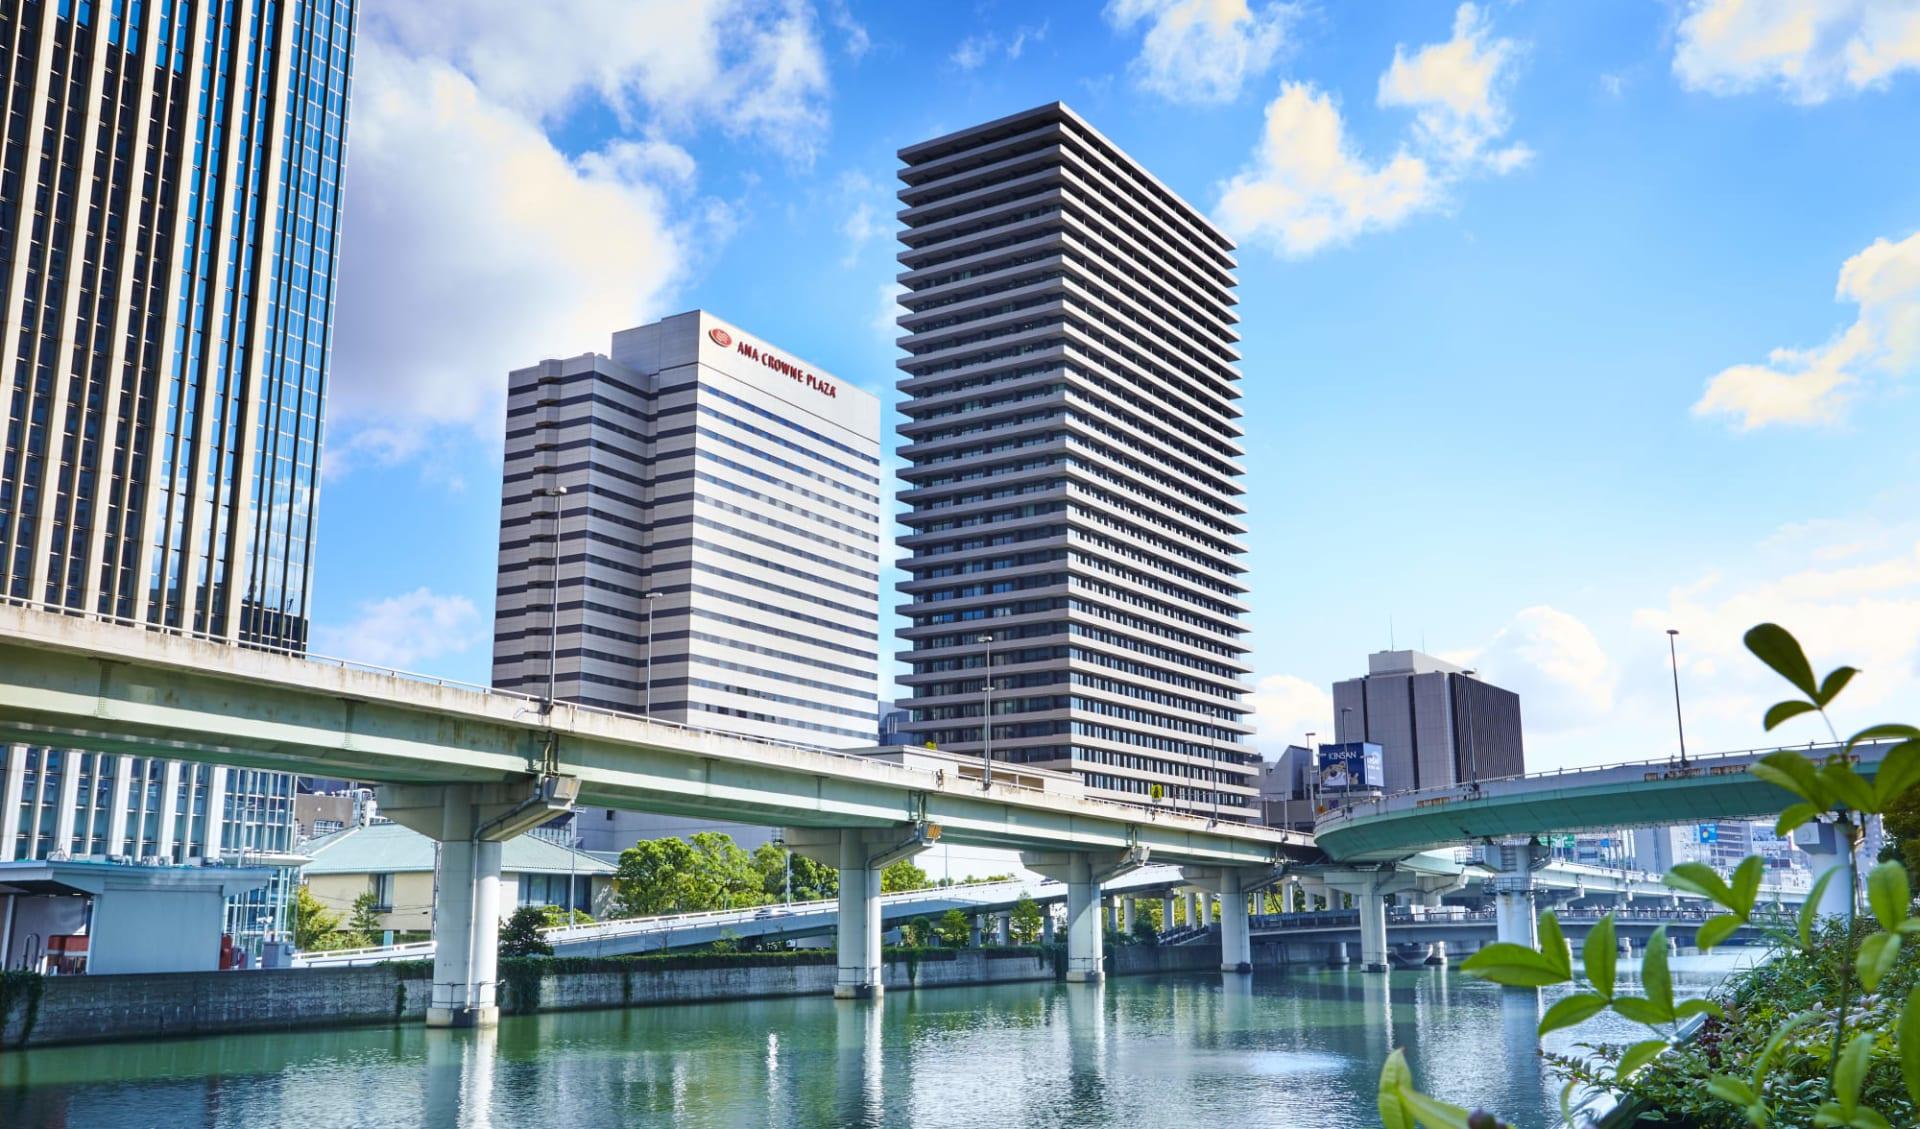 ANA Crowne Plaza in Osaka: Location